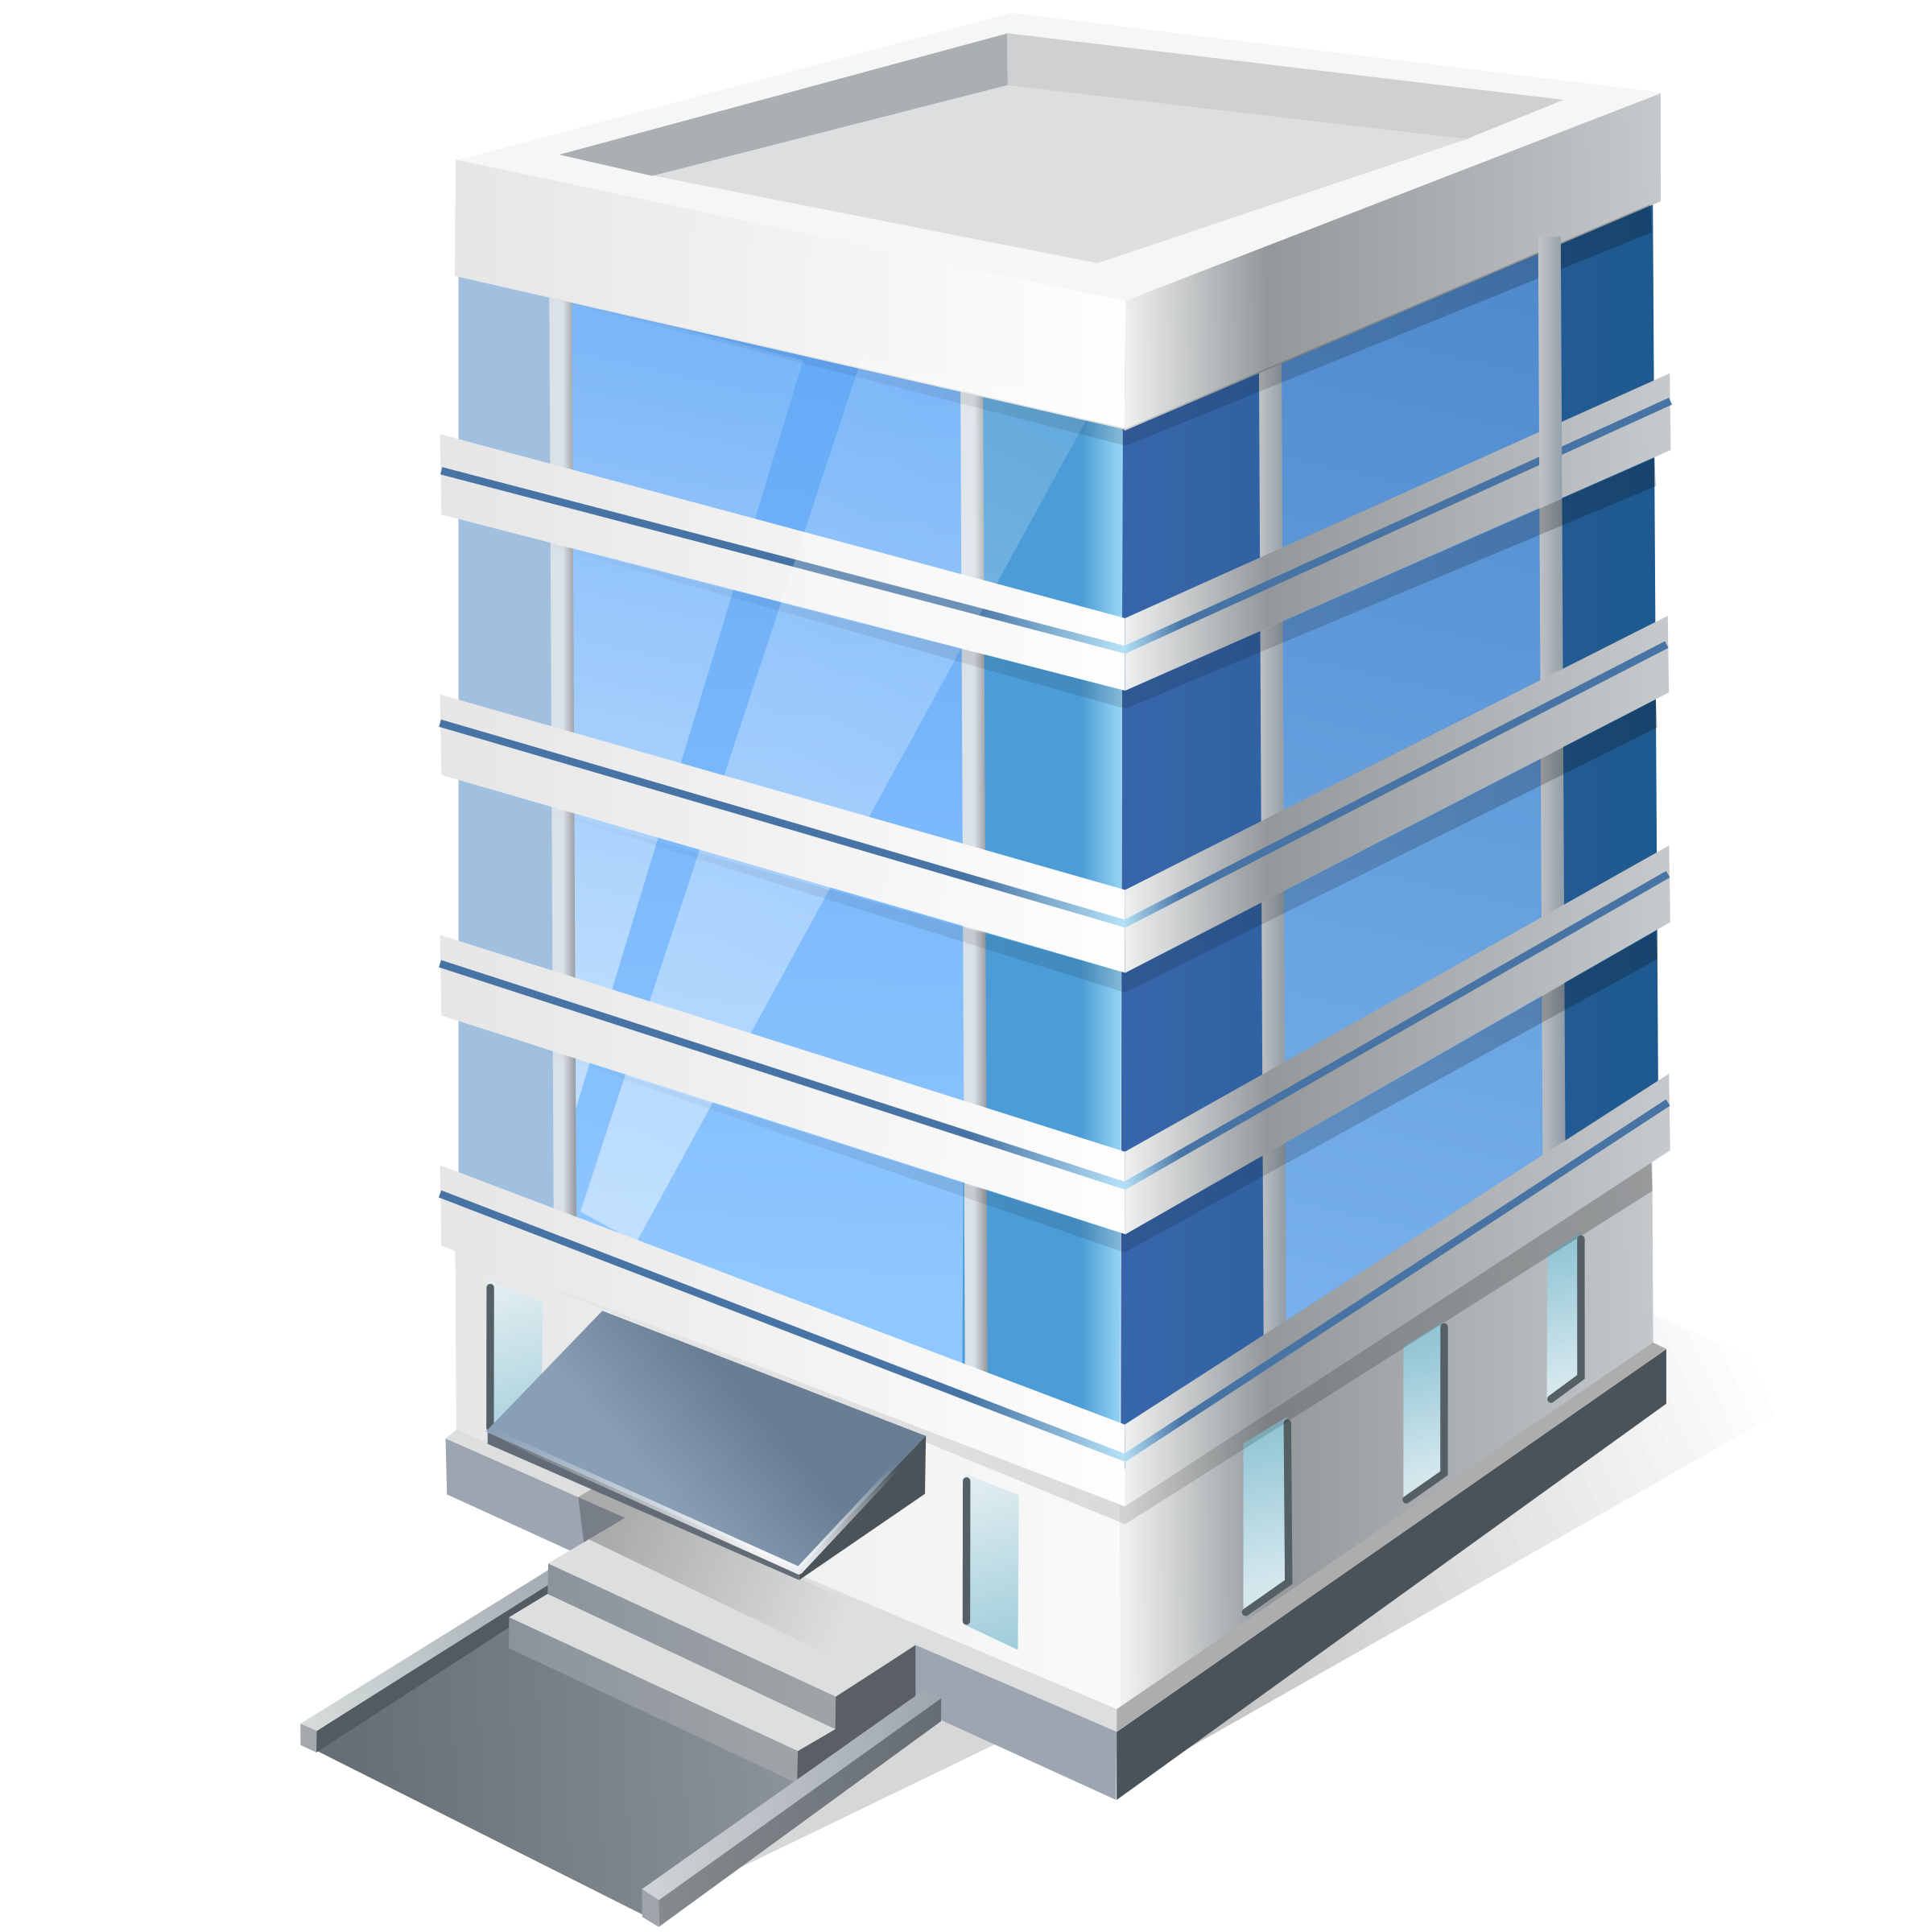 Free clip art buildings-Free clip art buildings-9